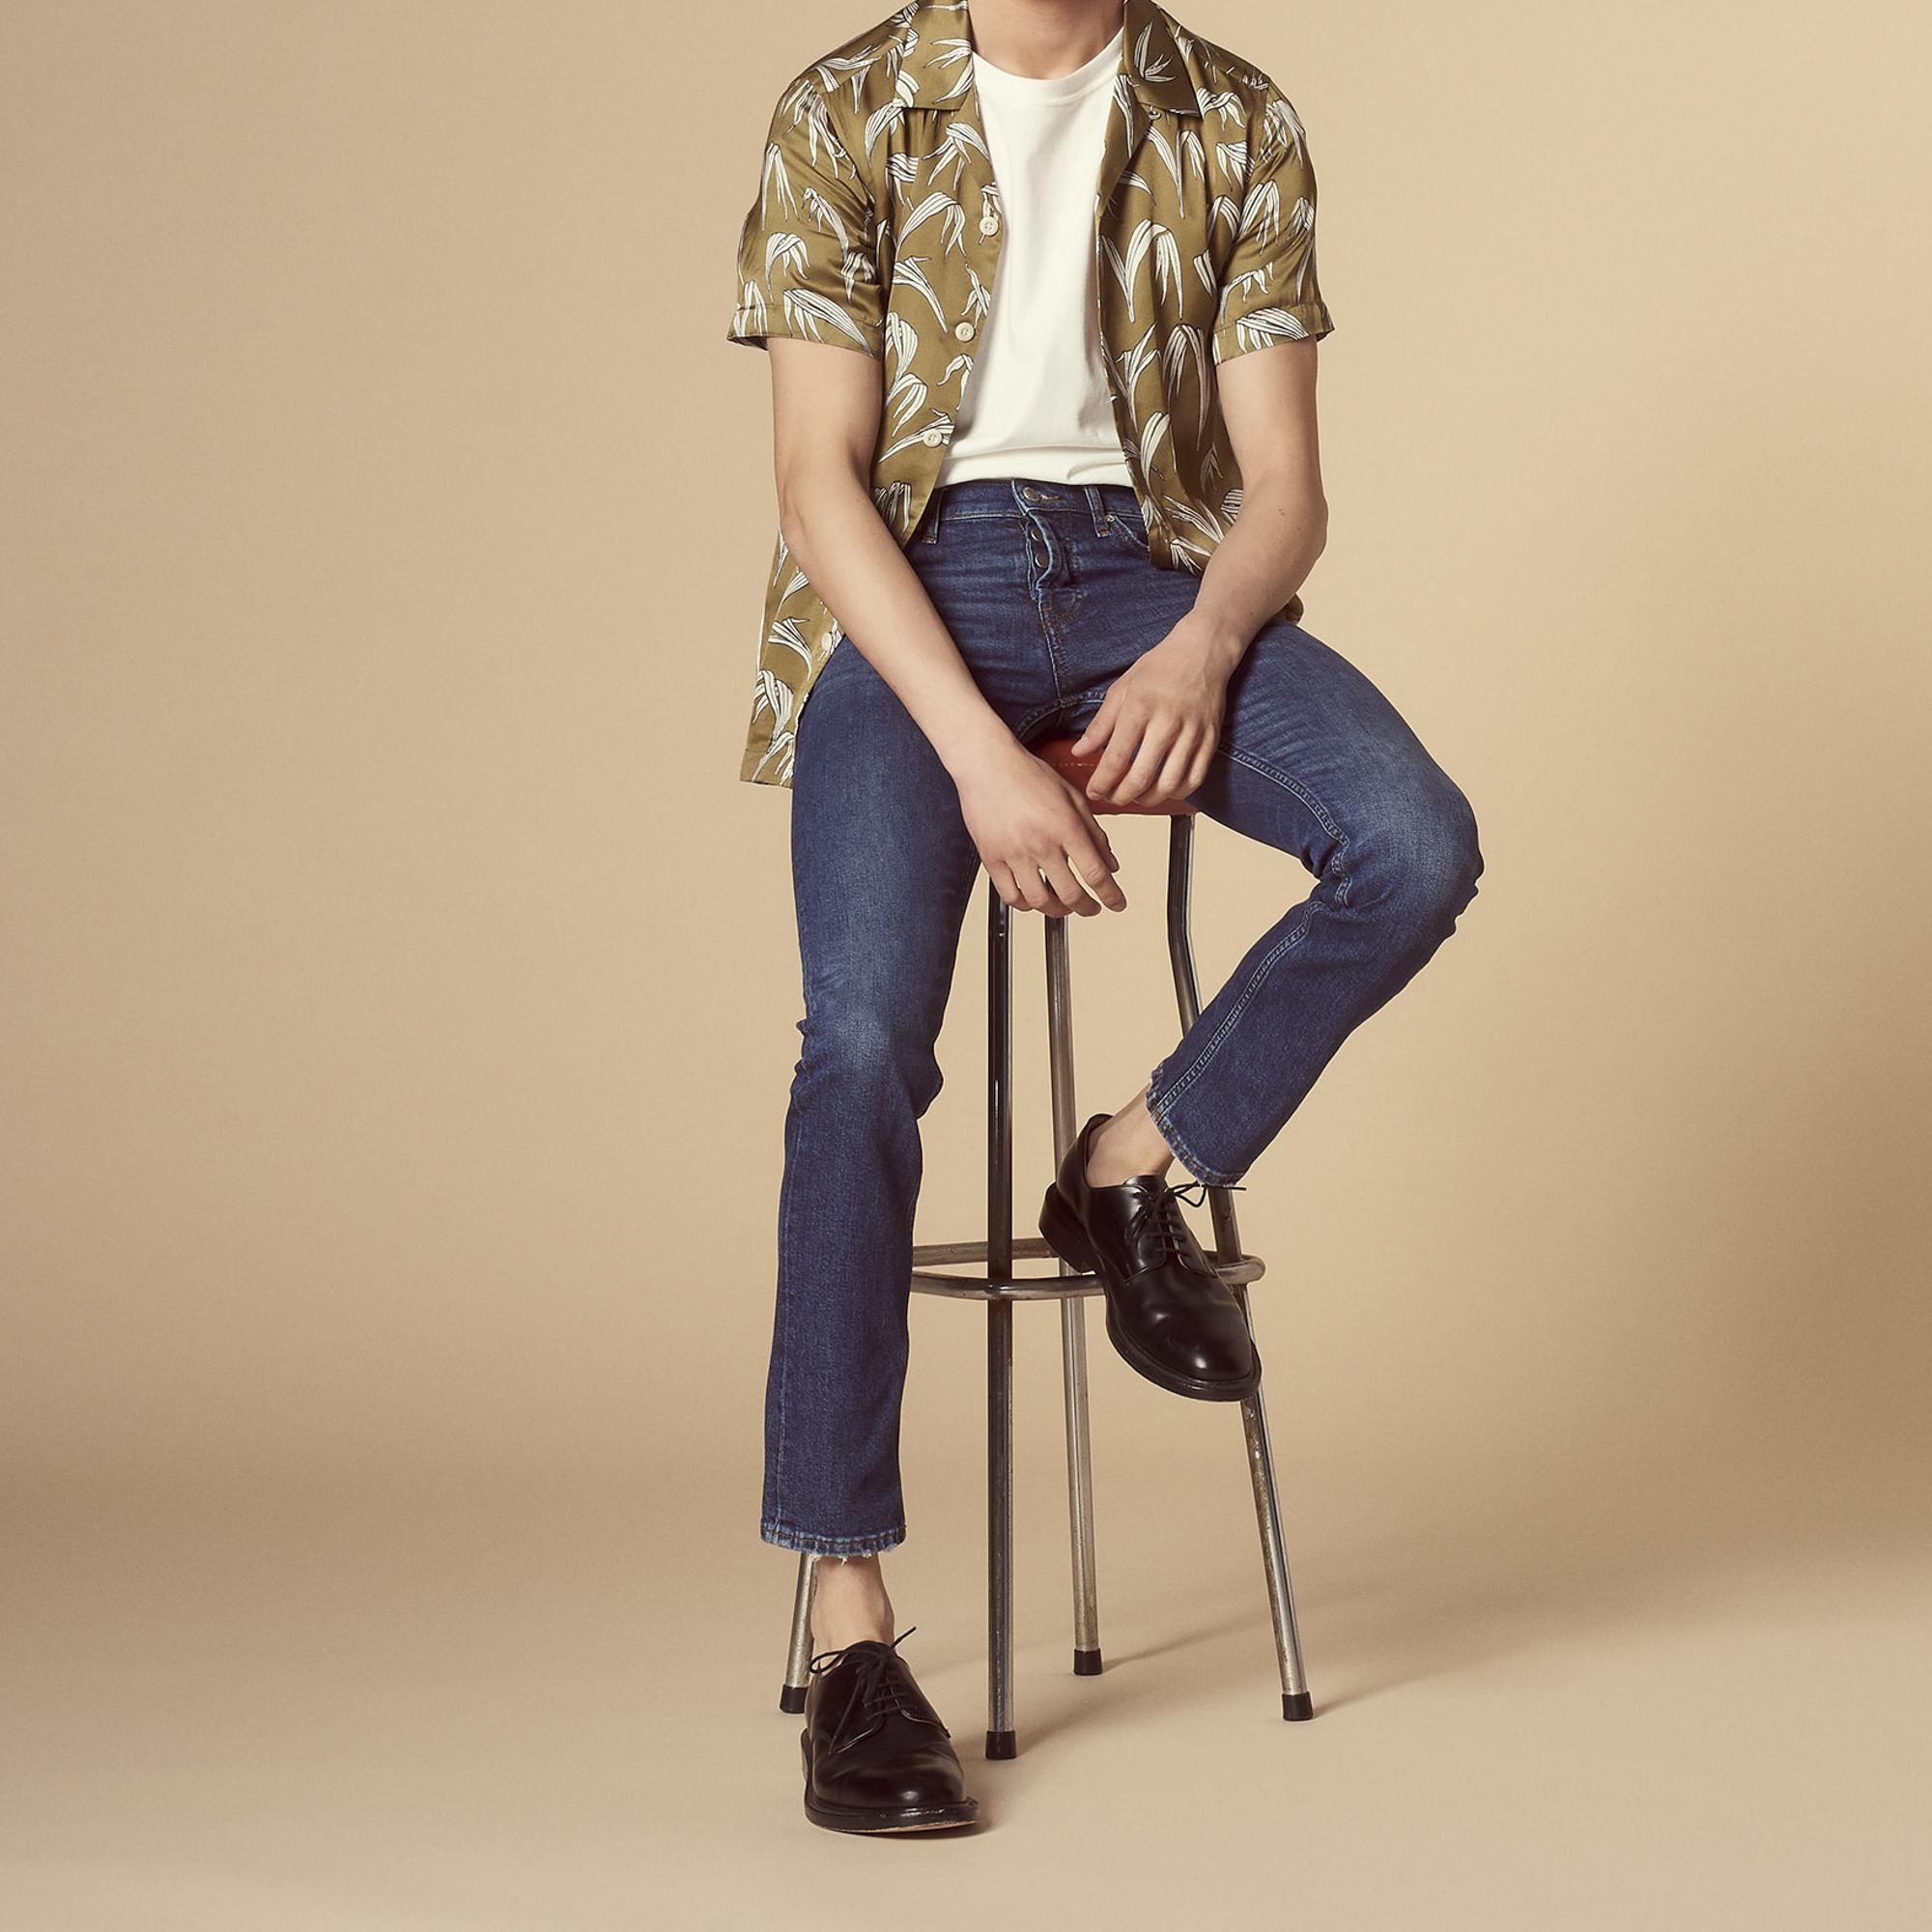 Jeans blu in denim linea dritta : Jeans colore Blue Vintage - Denim